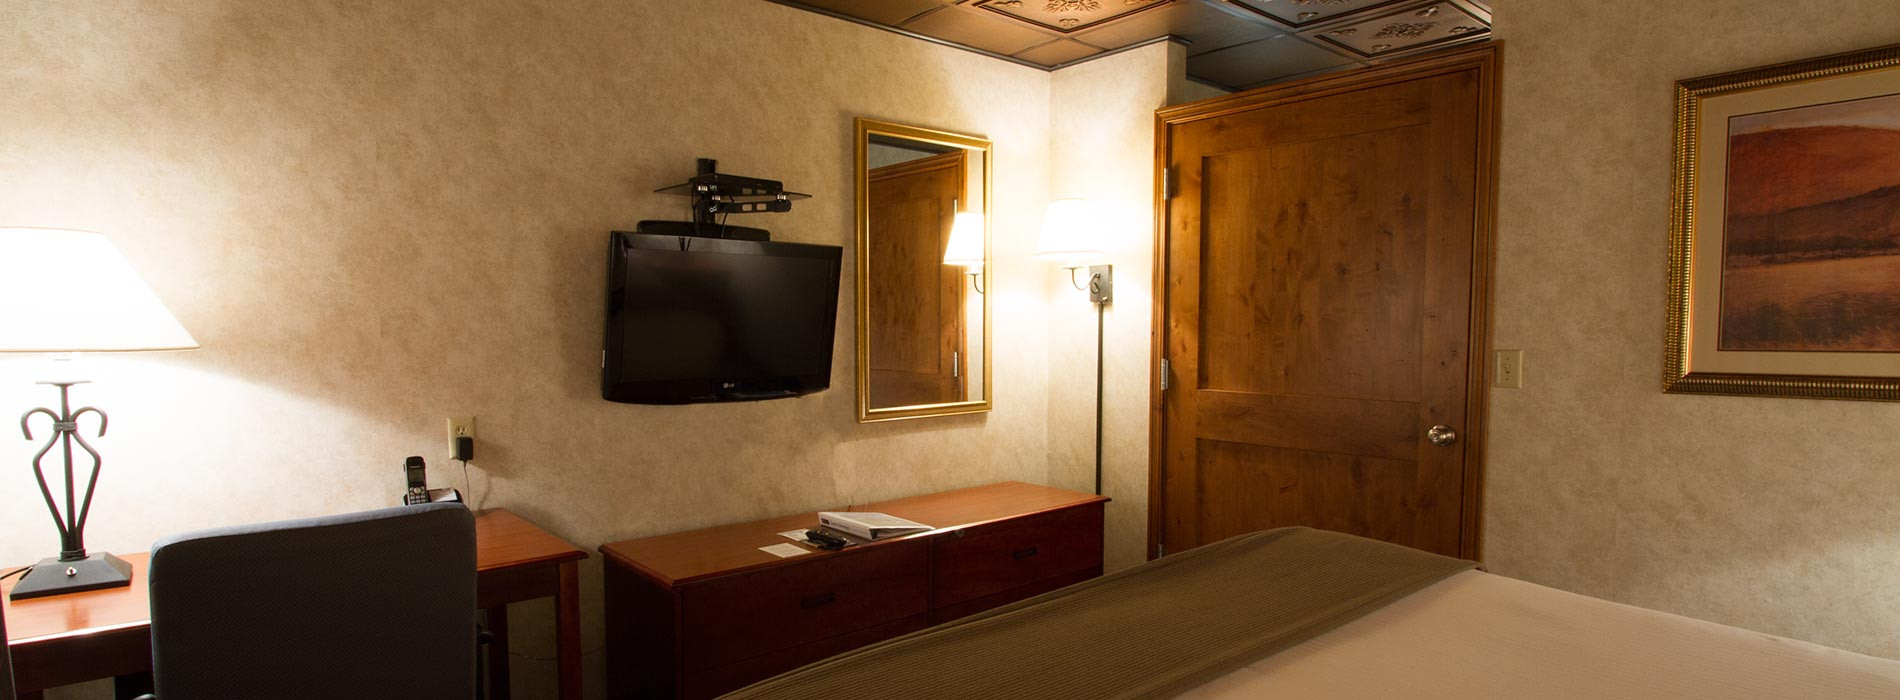 Ambassador Suite at the Miles City Hotel & Suites, Miles City, Montana